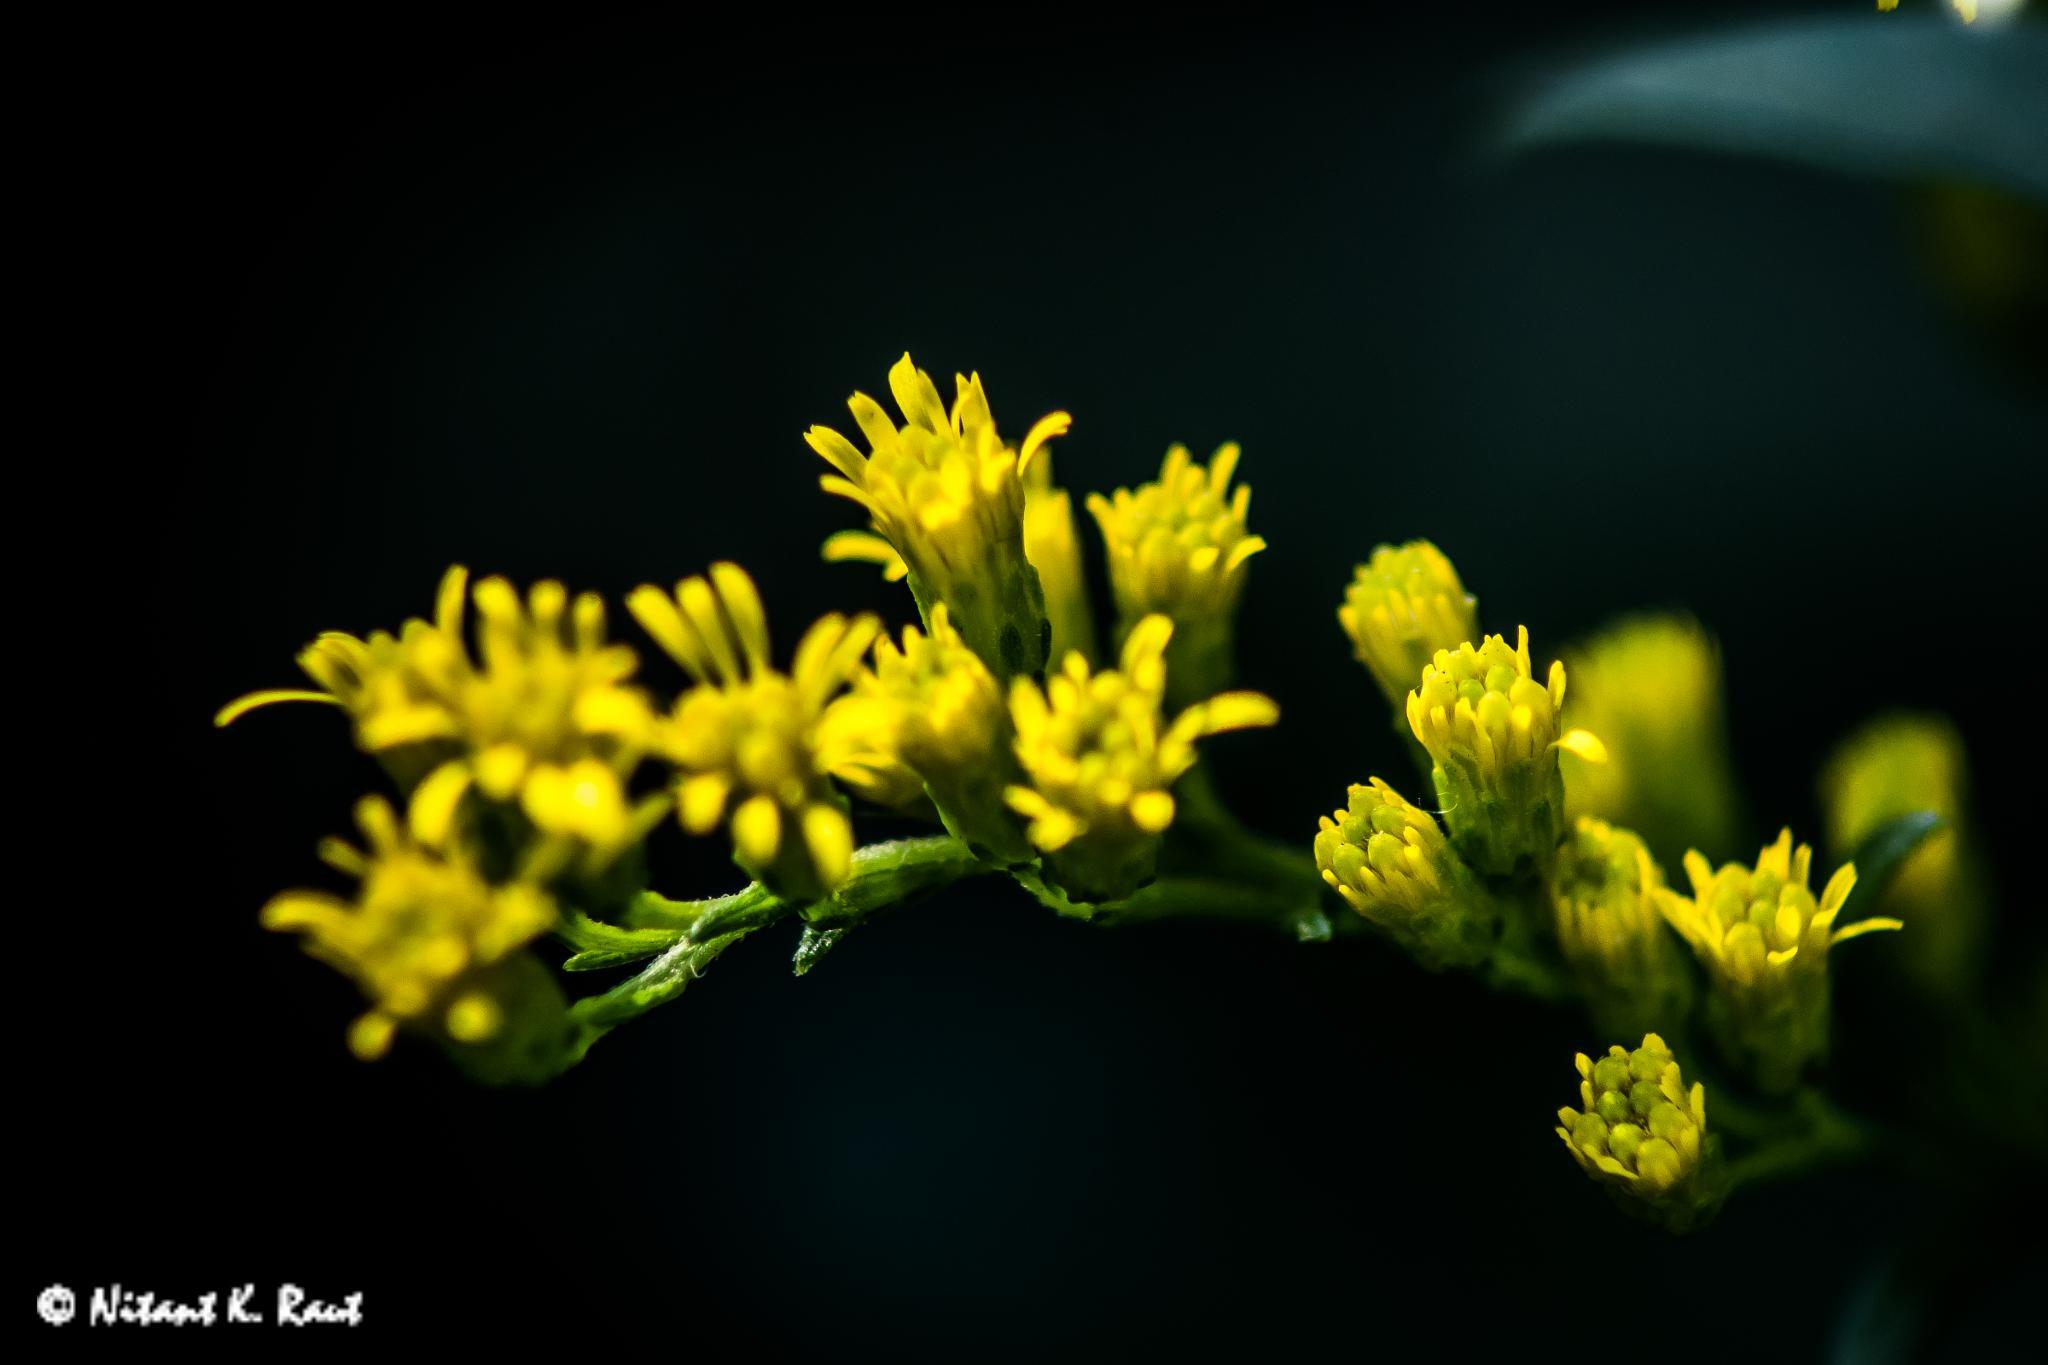 Flowers by Nitant K. Raut